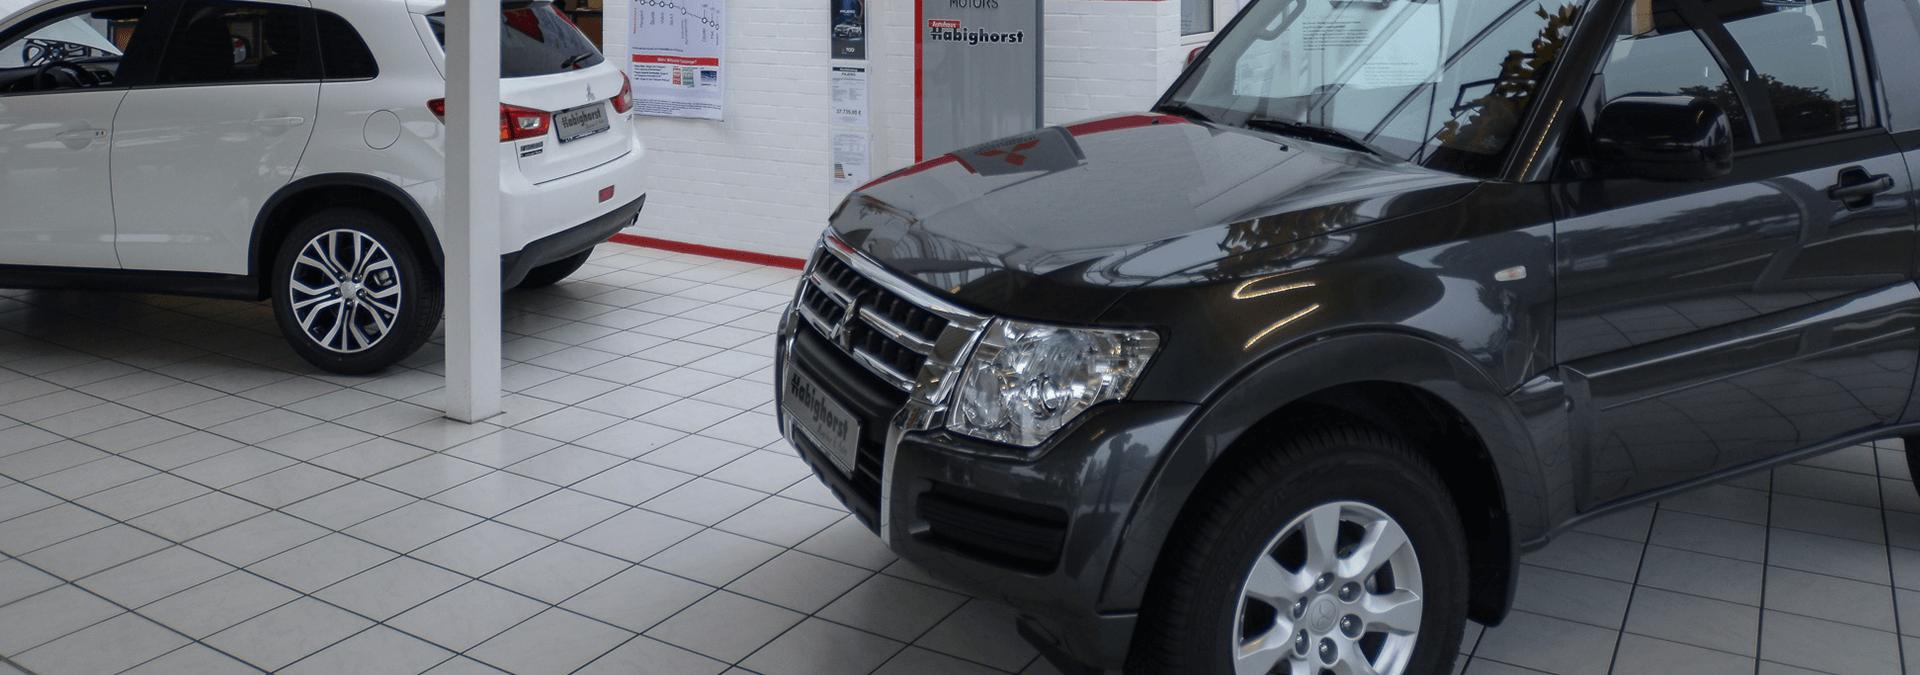 Autohaus Habighorst - Fahrzeuge